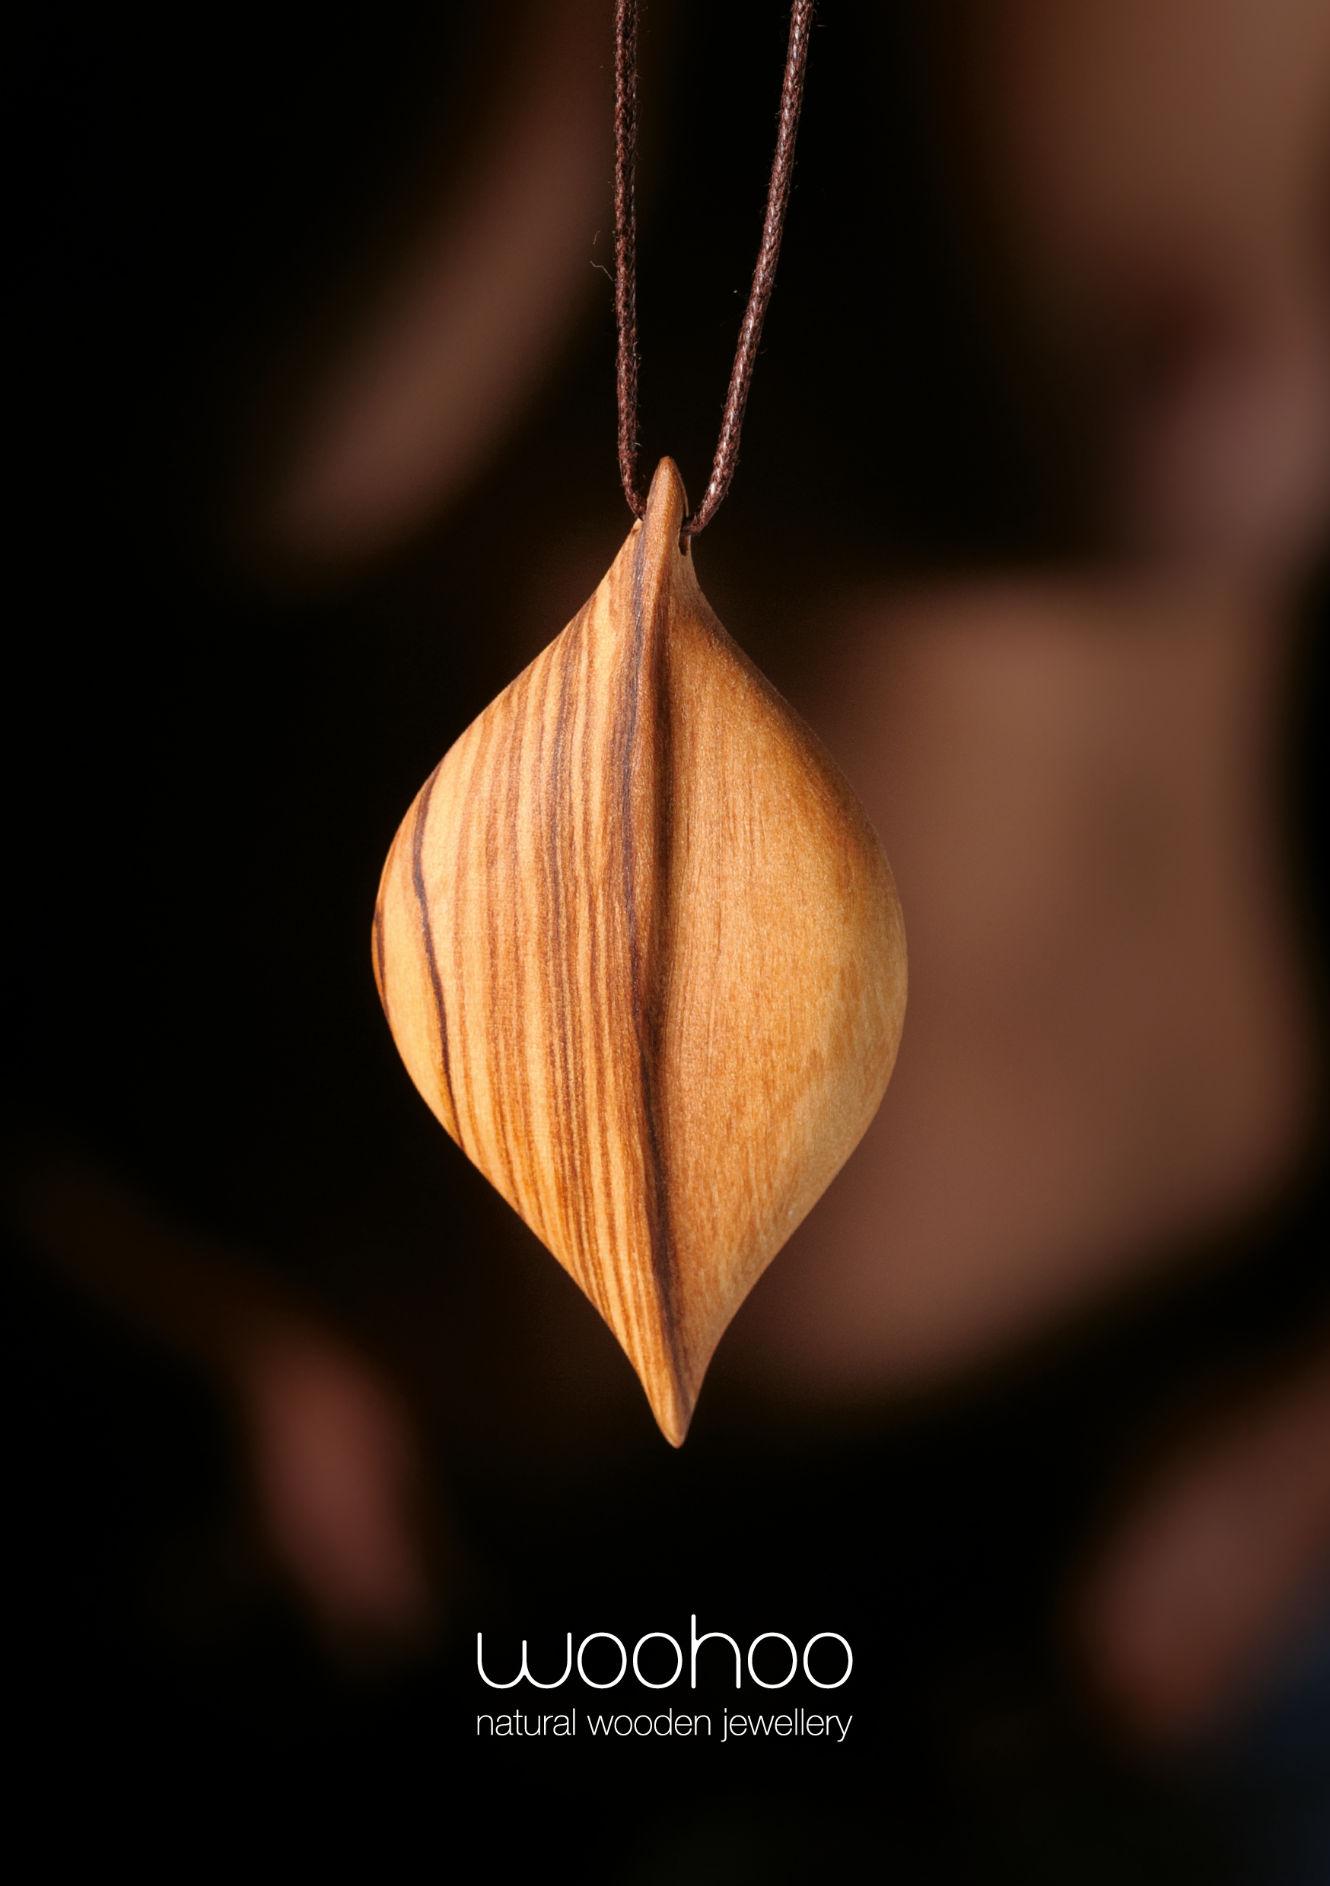 Letak Woohoo lesen nakit - žensko telo